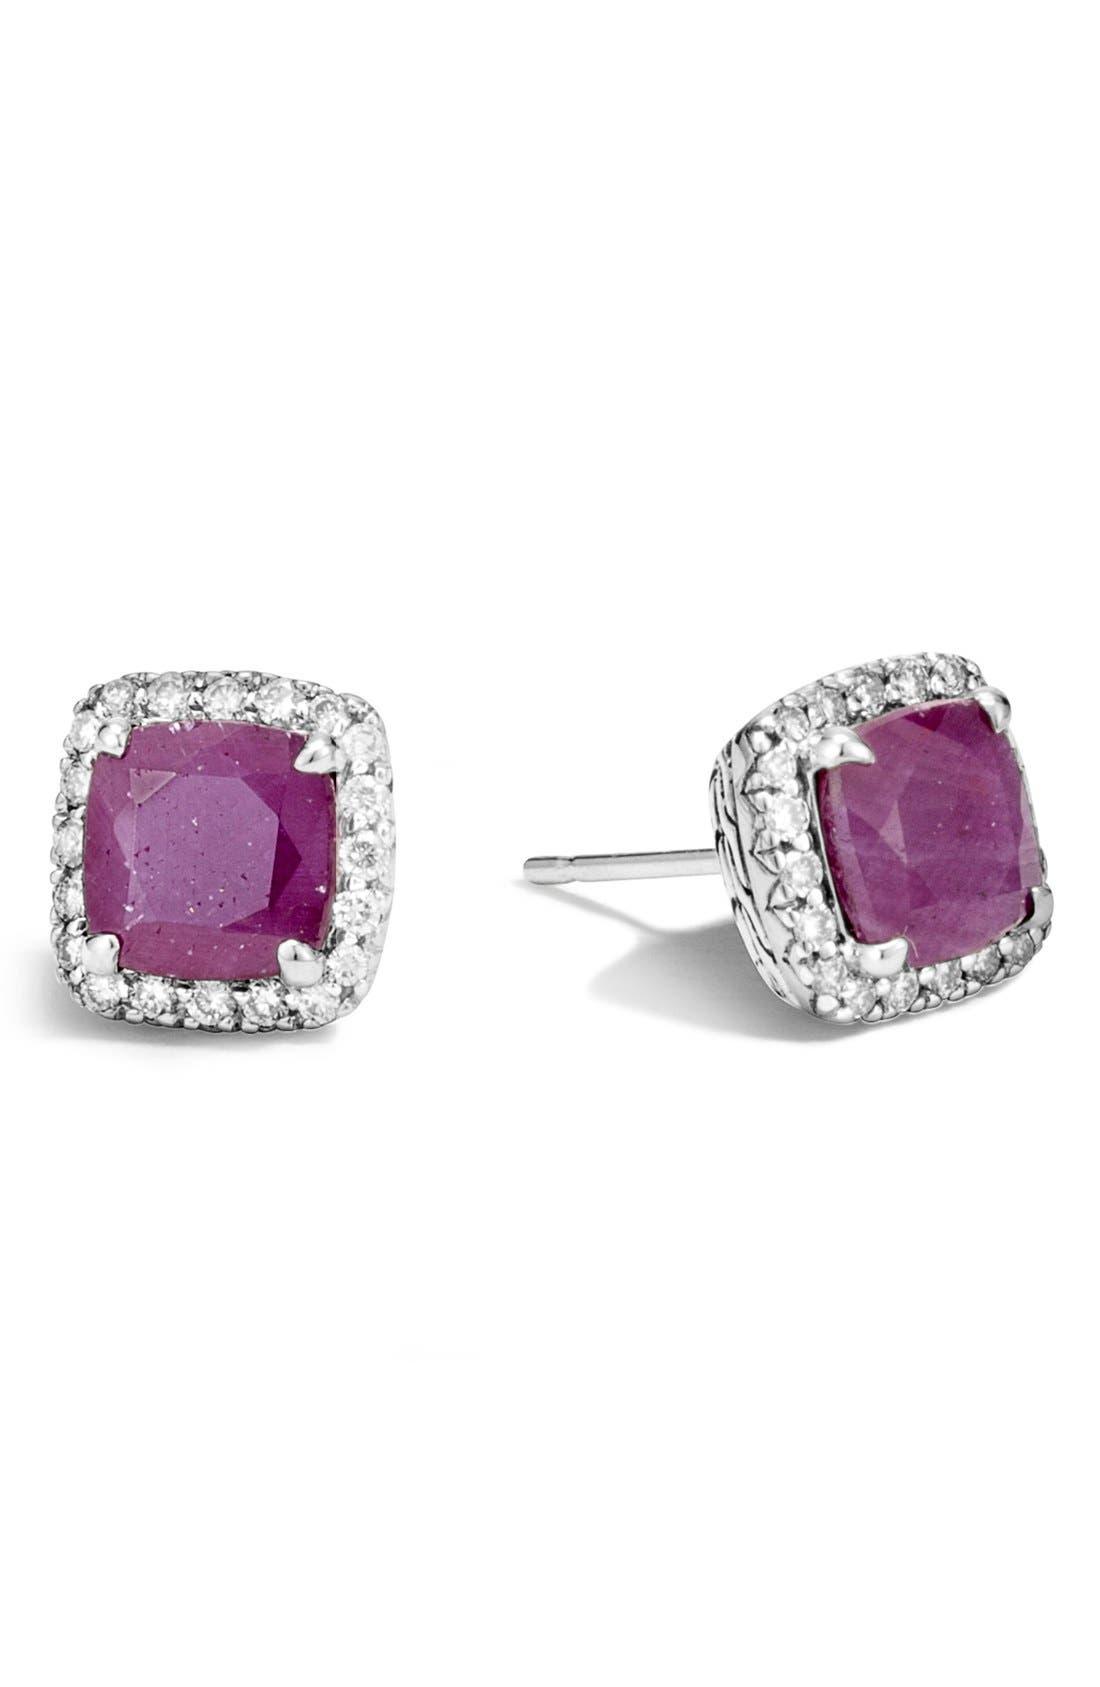 John Hardy Classic Chain - Batu Precious Stone & Pavé Diamond Stud Earrings